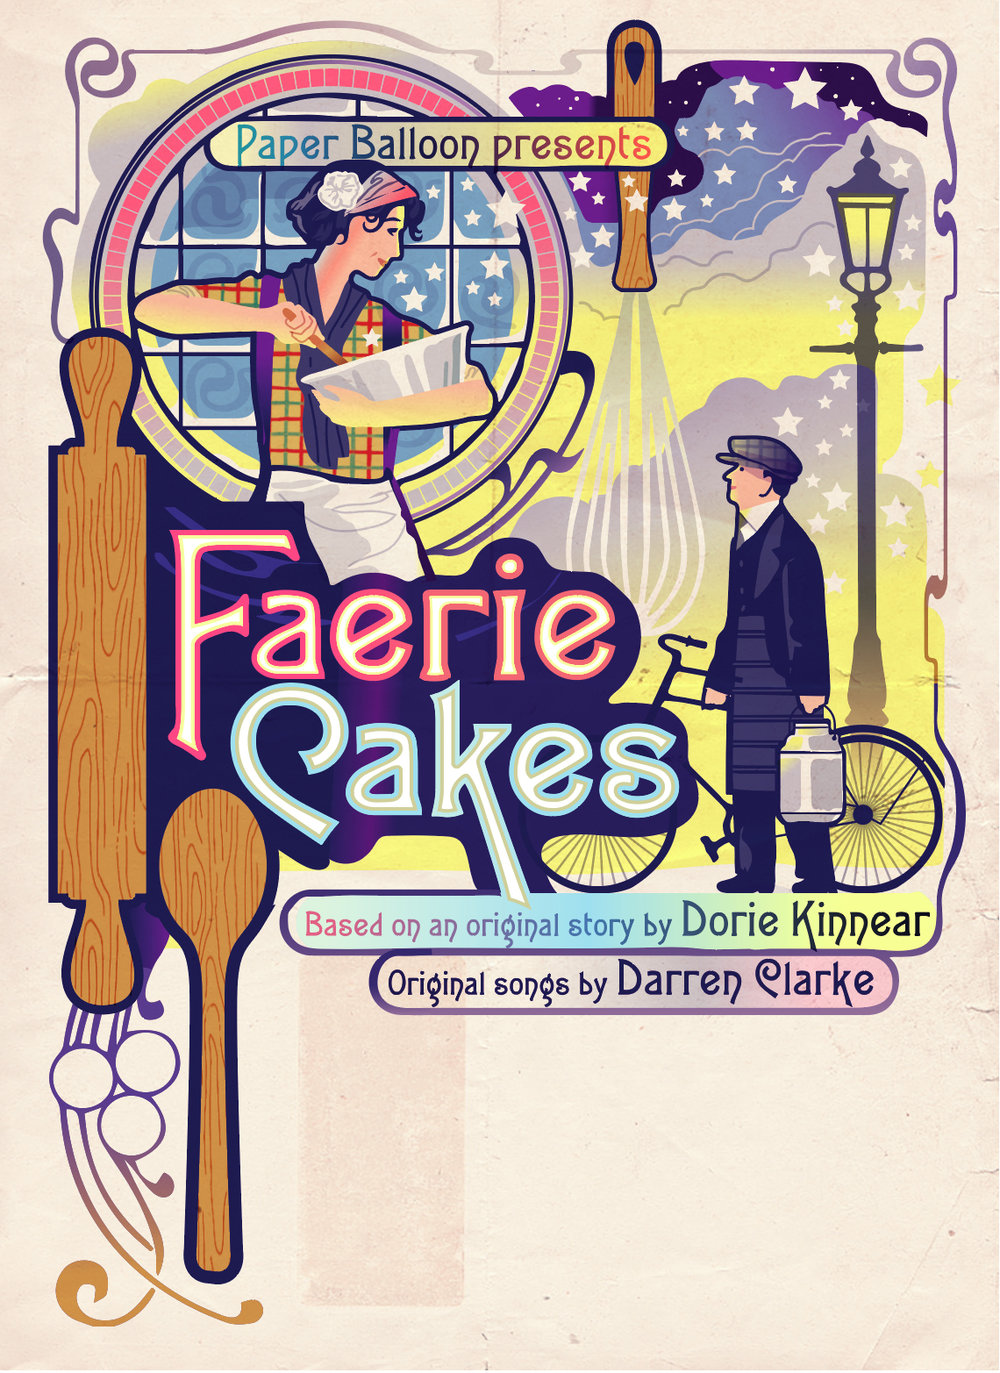 Faerie Cakes for approval.jpg